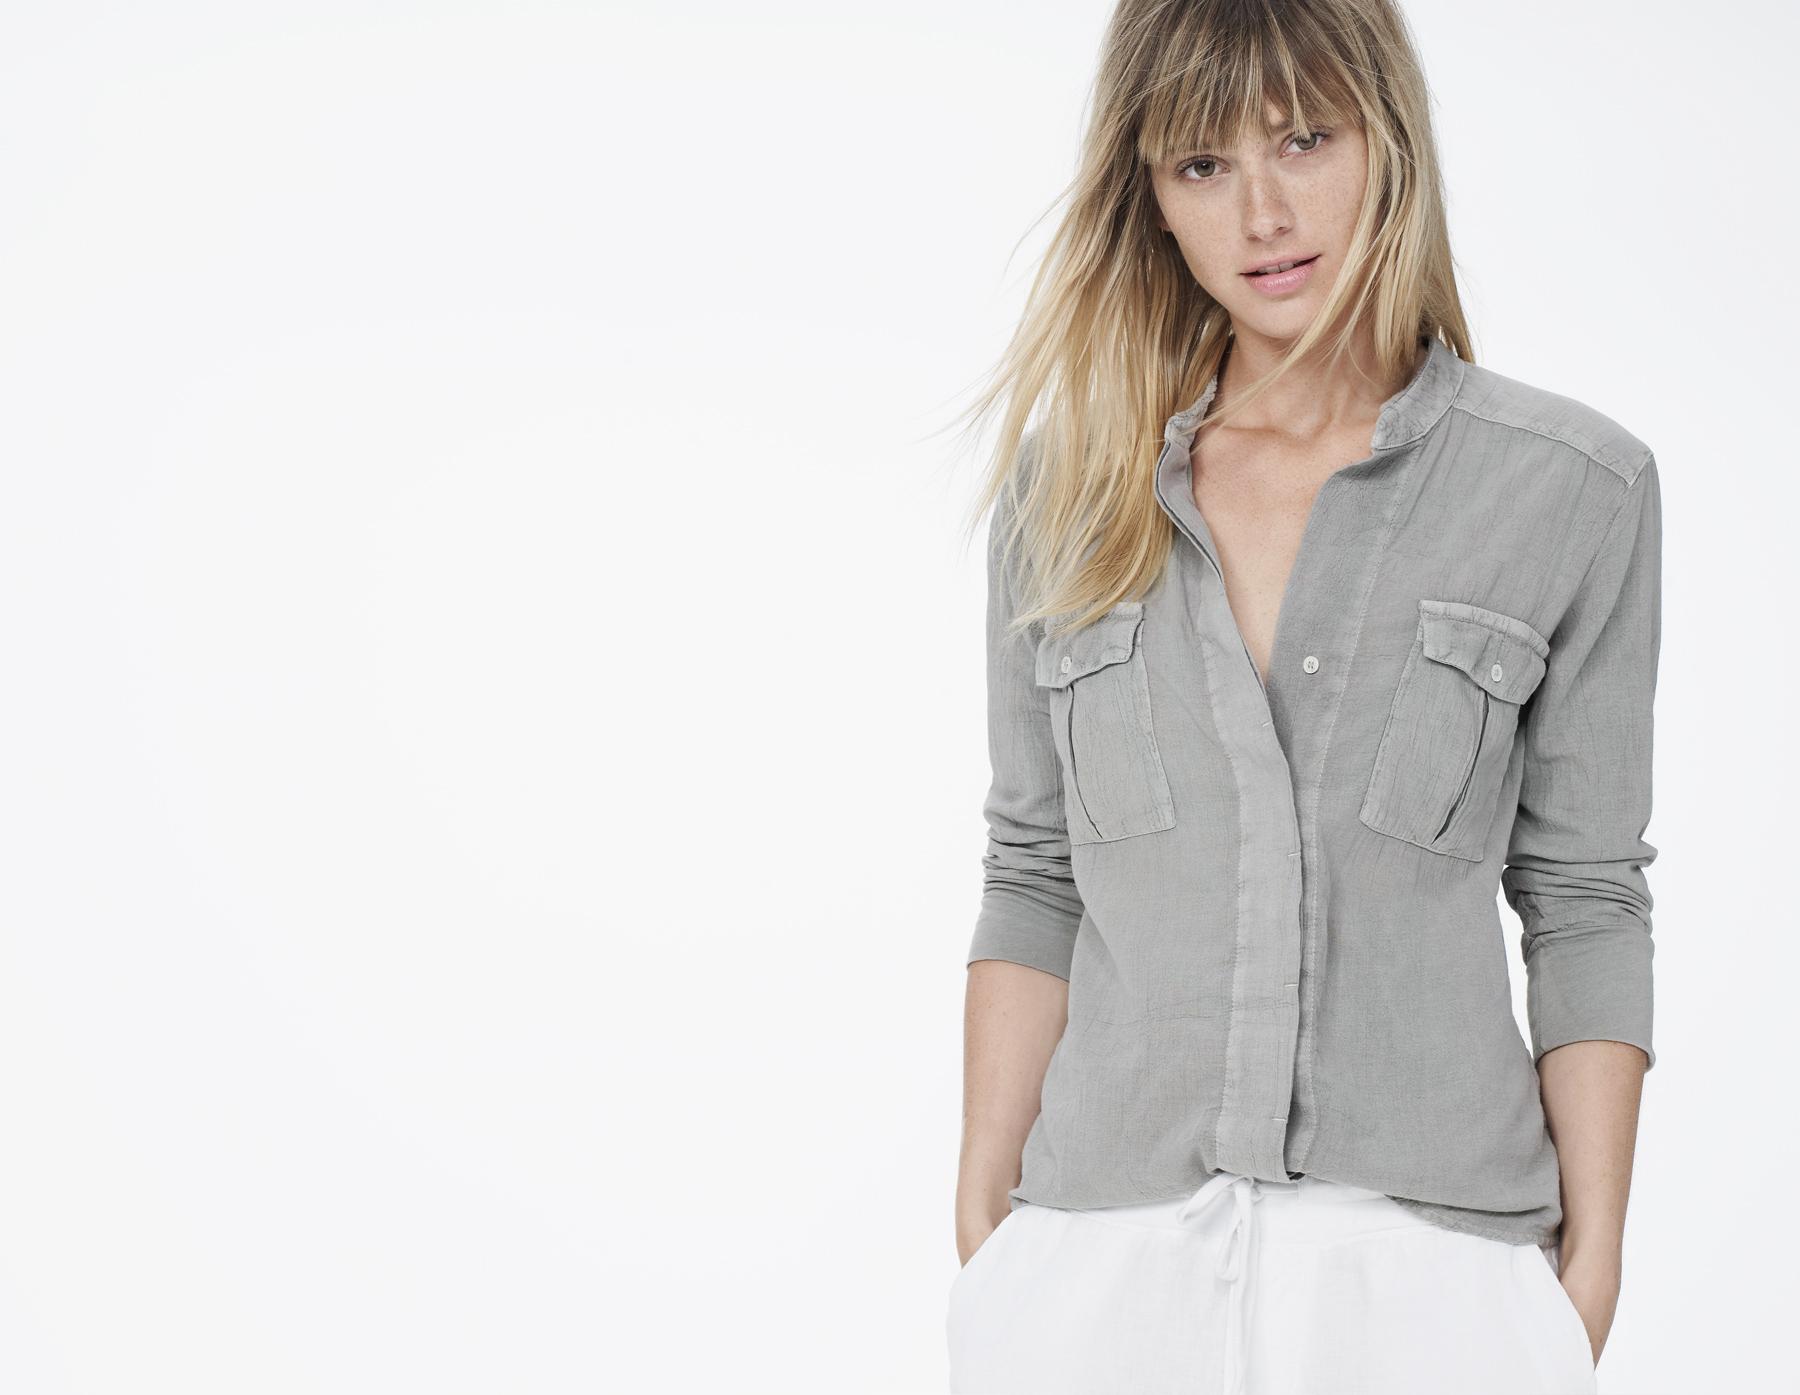 e8b91767 James Perse Cotton Gauze Collarless Safari Shirt in Gray - Lyst